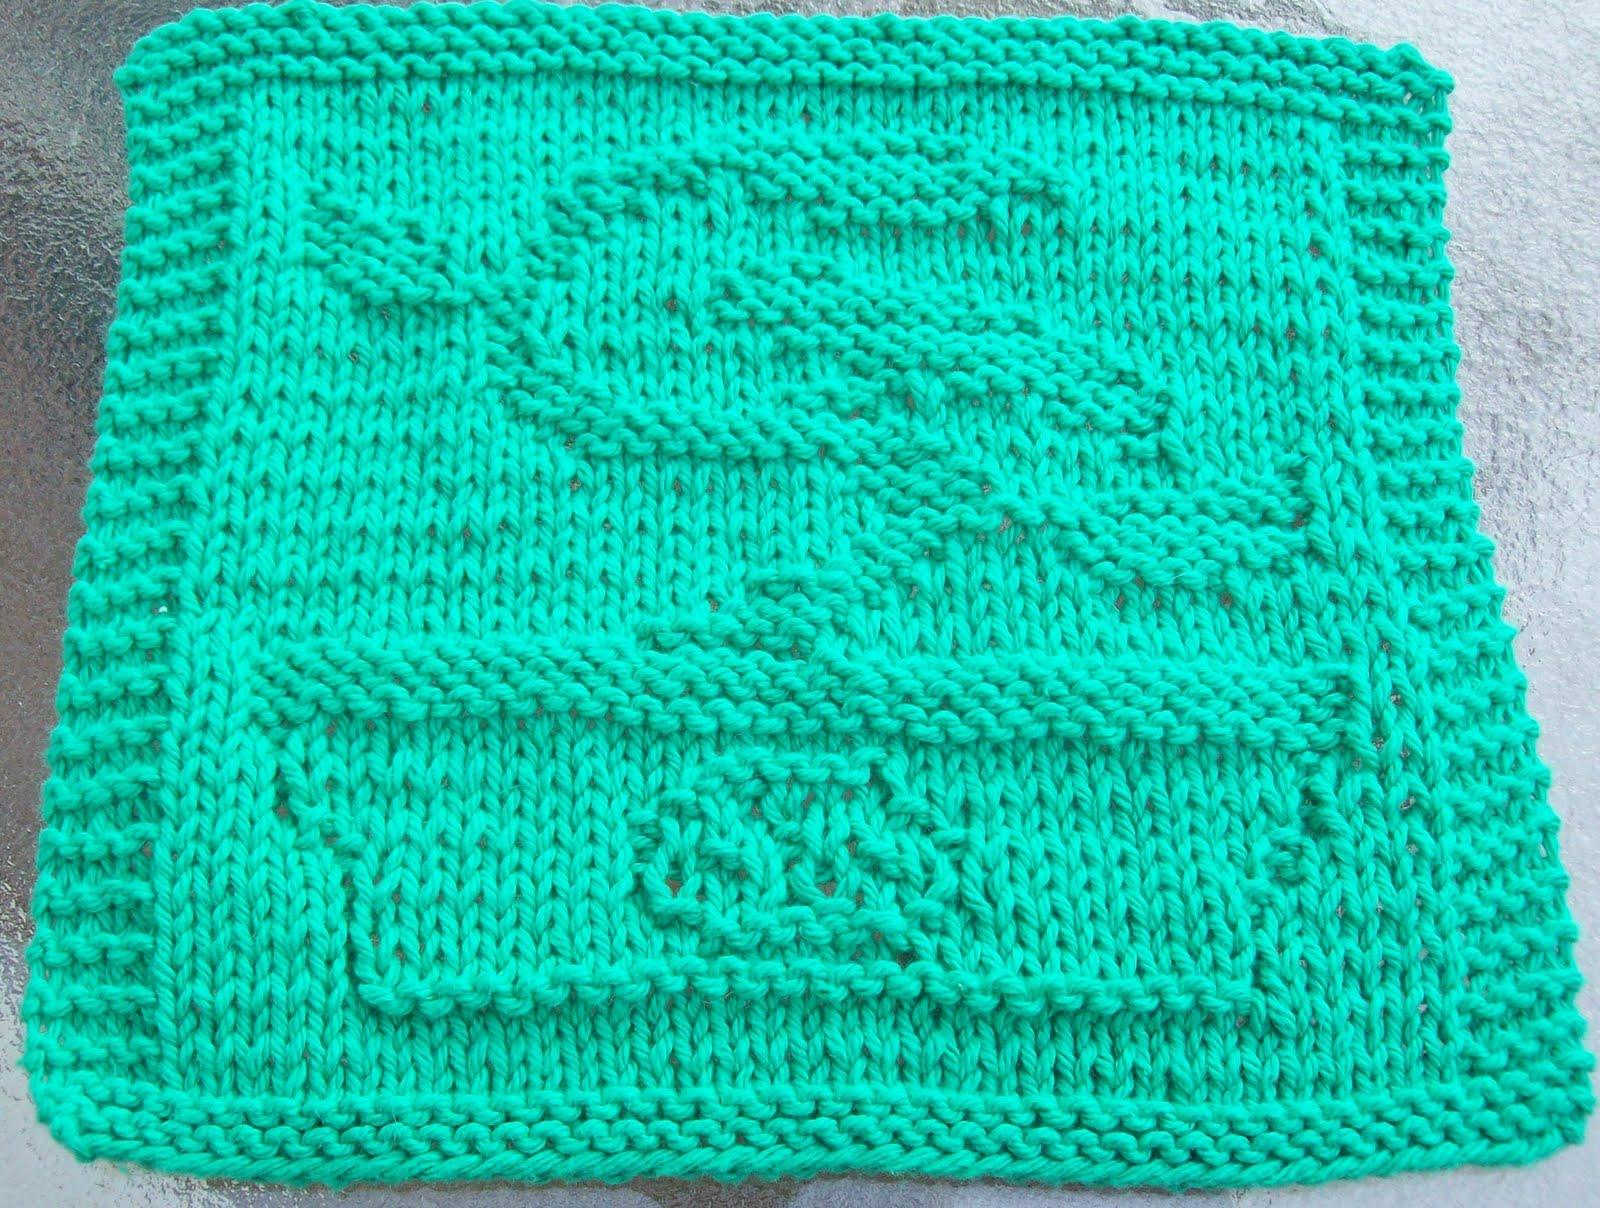 Free Knitting Pattern Tree Dishcloth : DigKnitty Designs: Bonsai Tree Knit Dishcloth Pattern